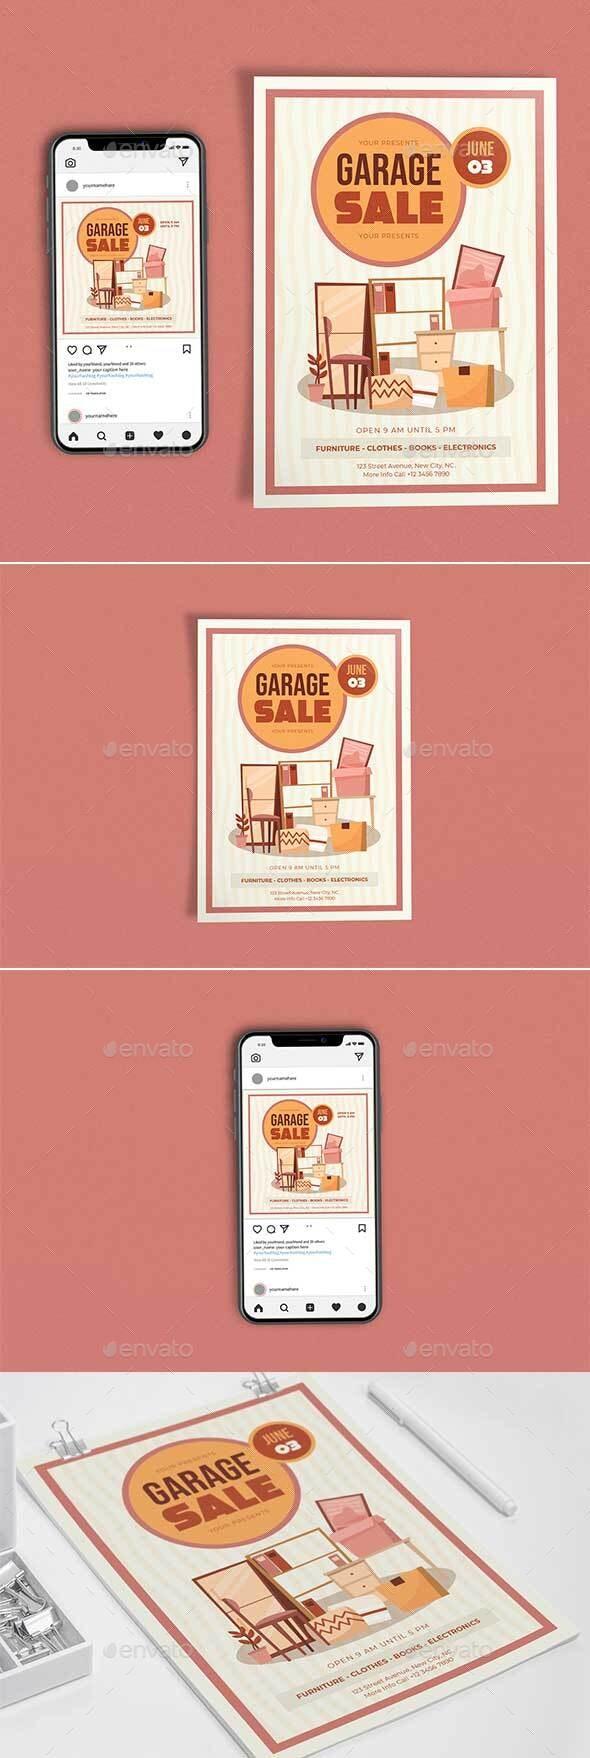 Simple Garage Sale Template Set - Events Flyers